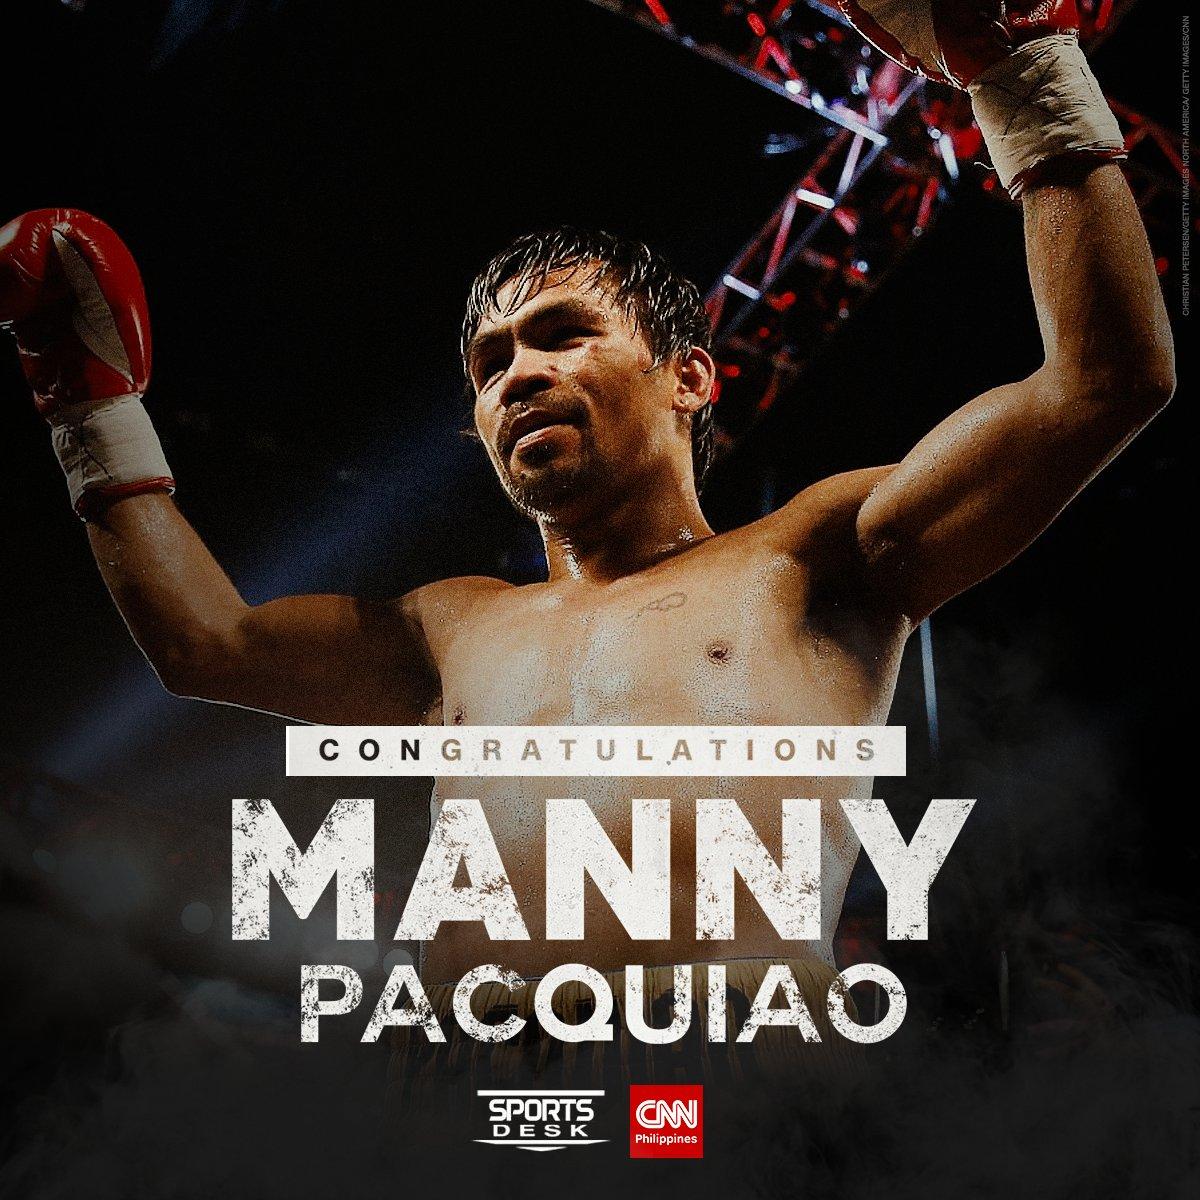 CNN Philippines's photo on Manny